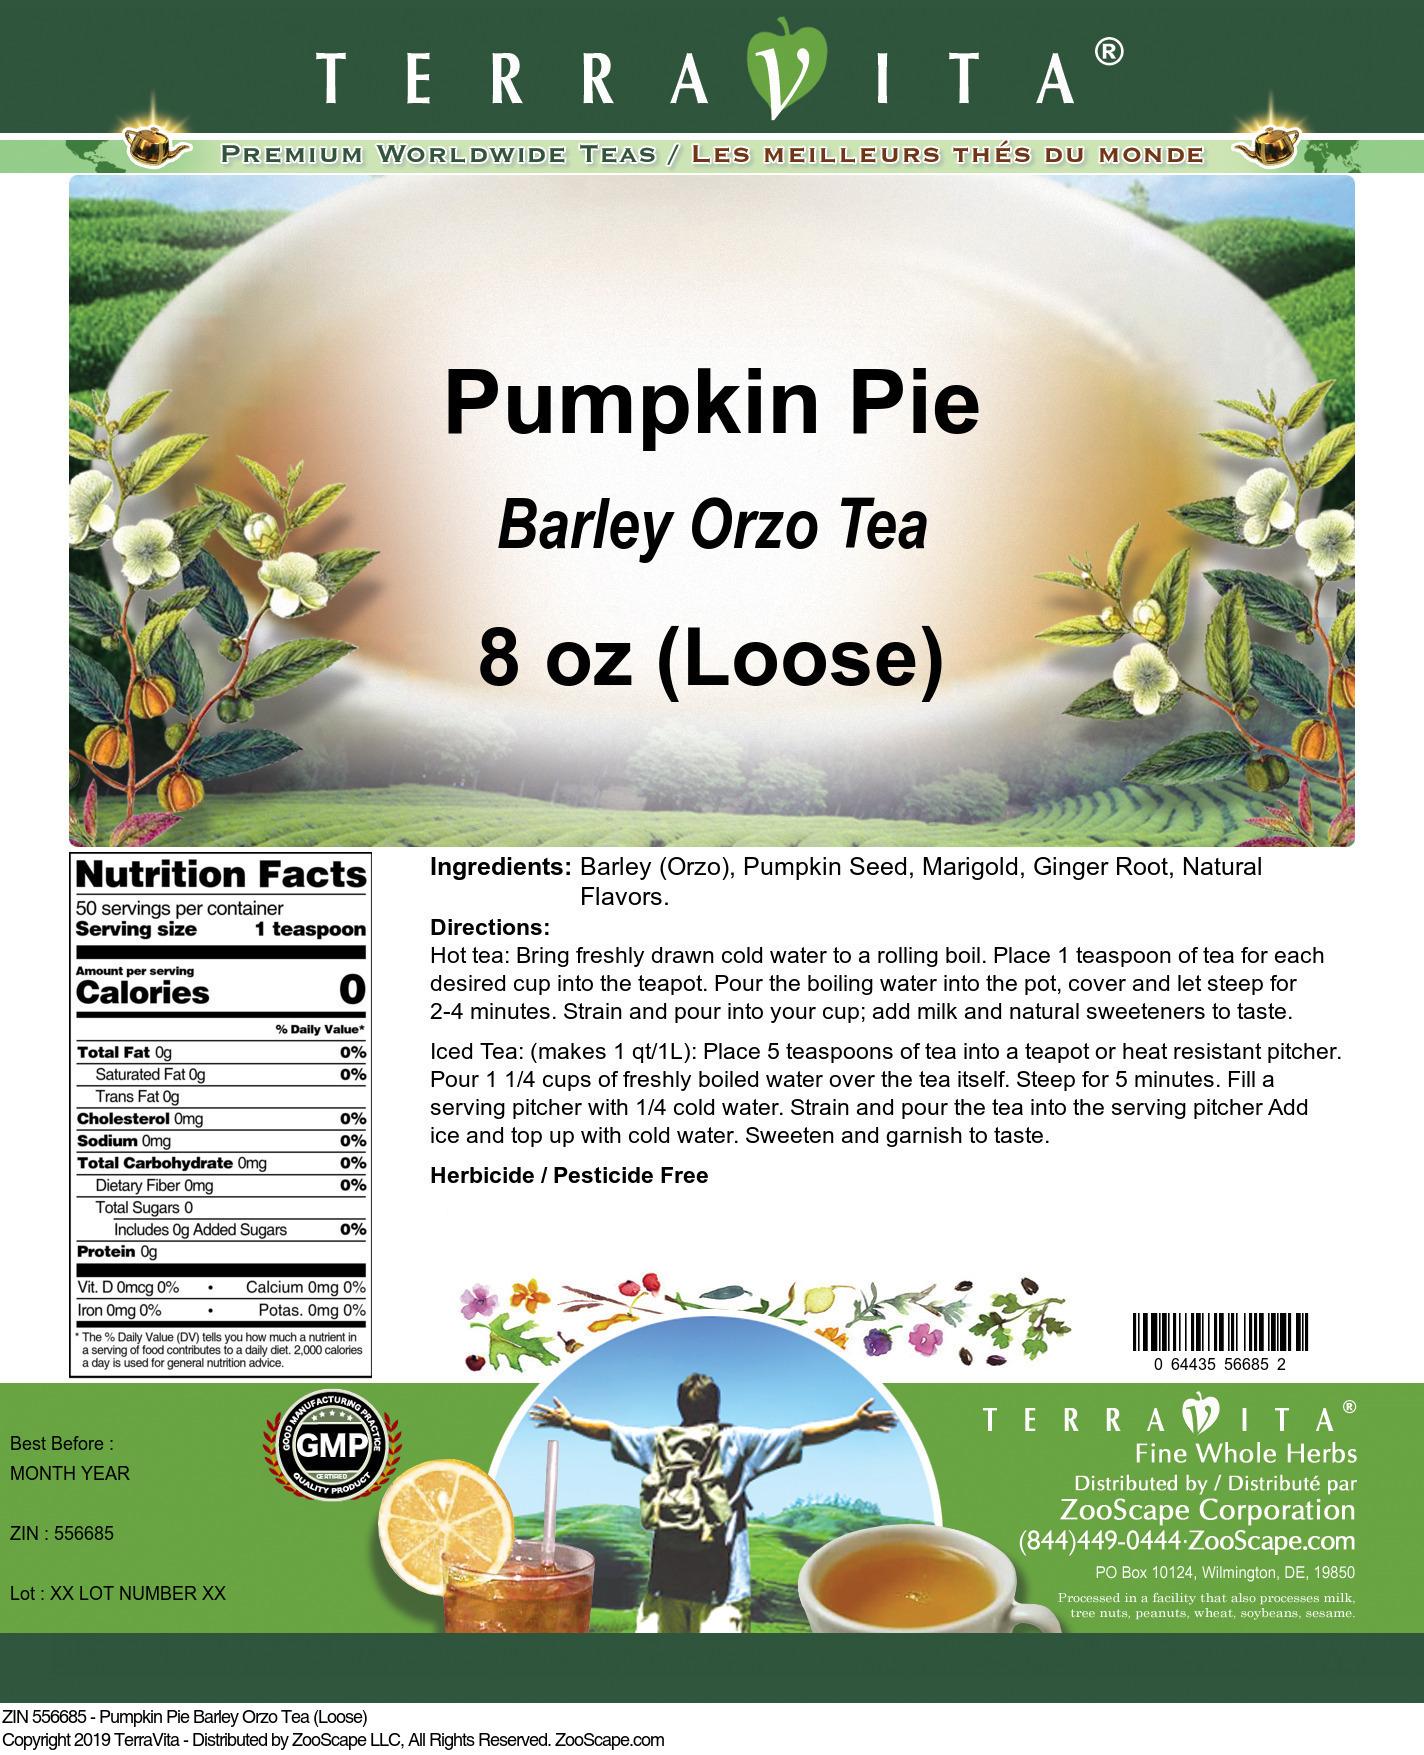 Pumpkin Pie Barley Orzo Tea (Loose)